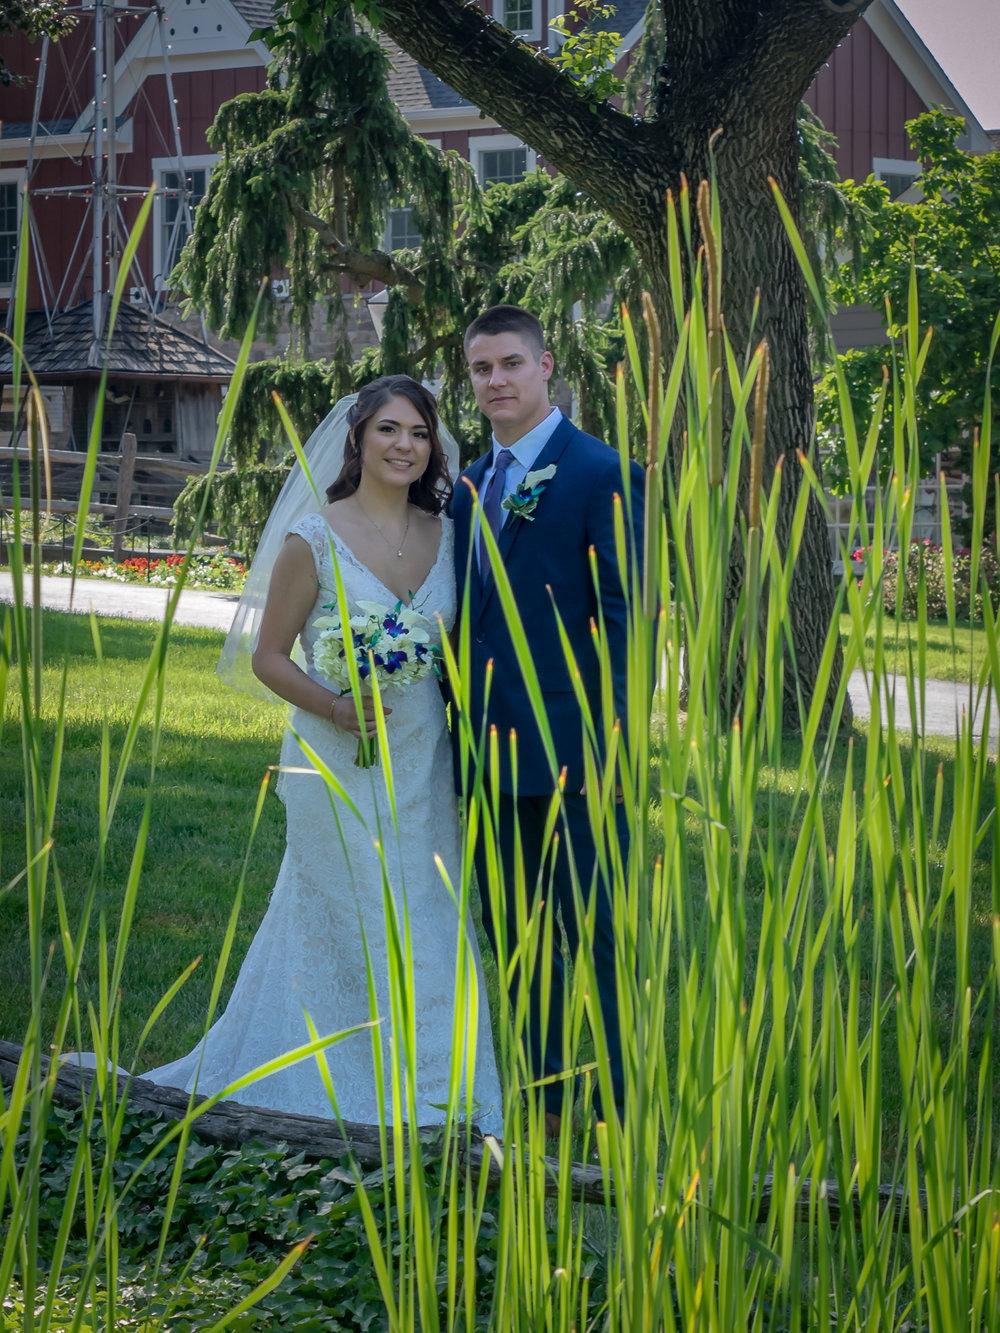 26 - Haines Couple - 20180616 - MLouis-67595.jpg